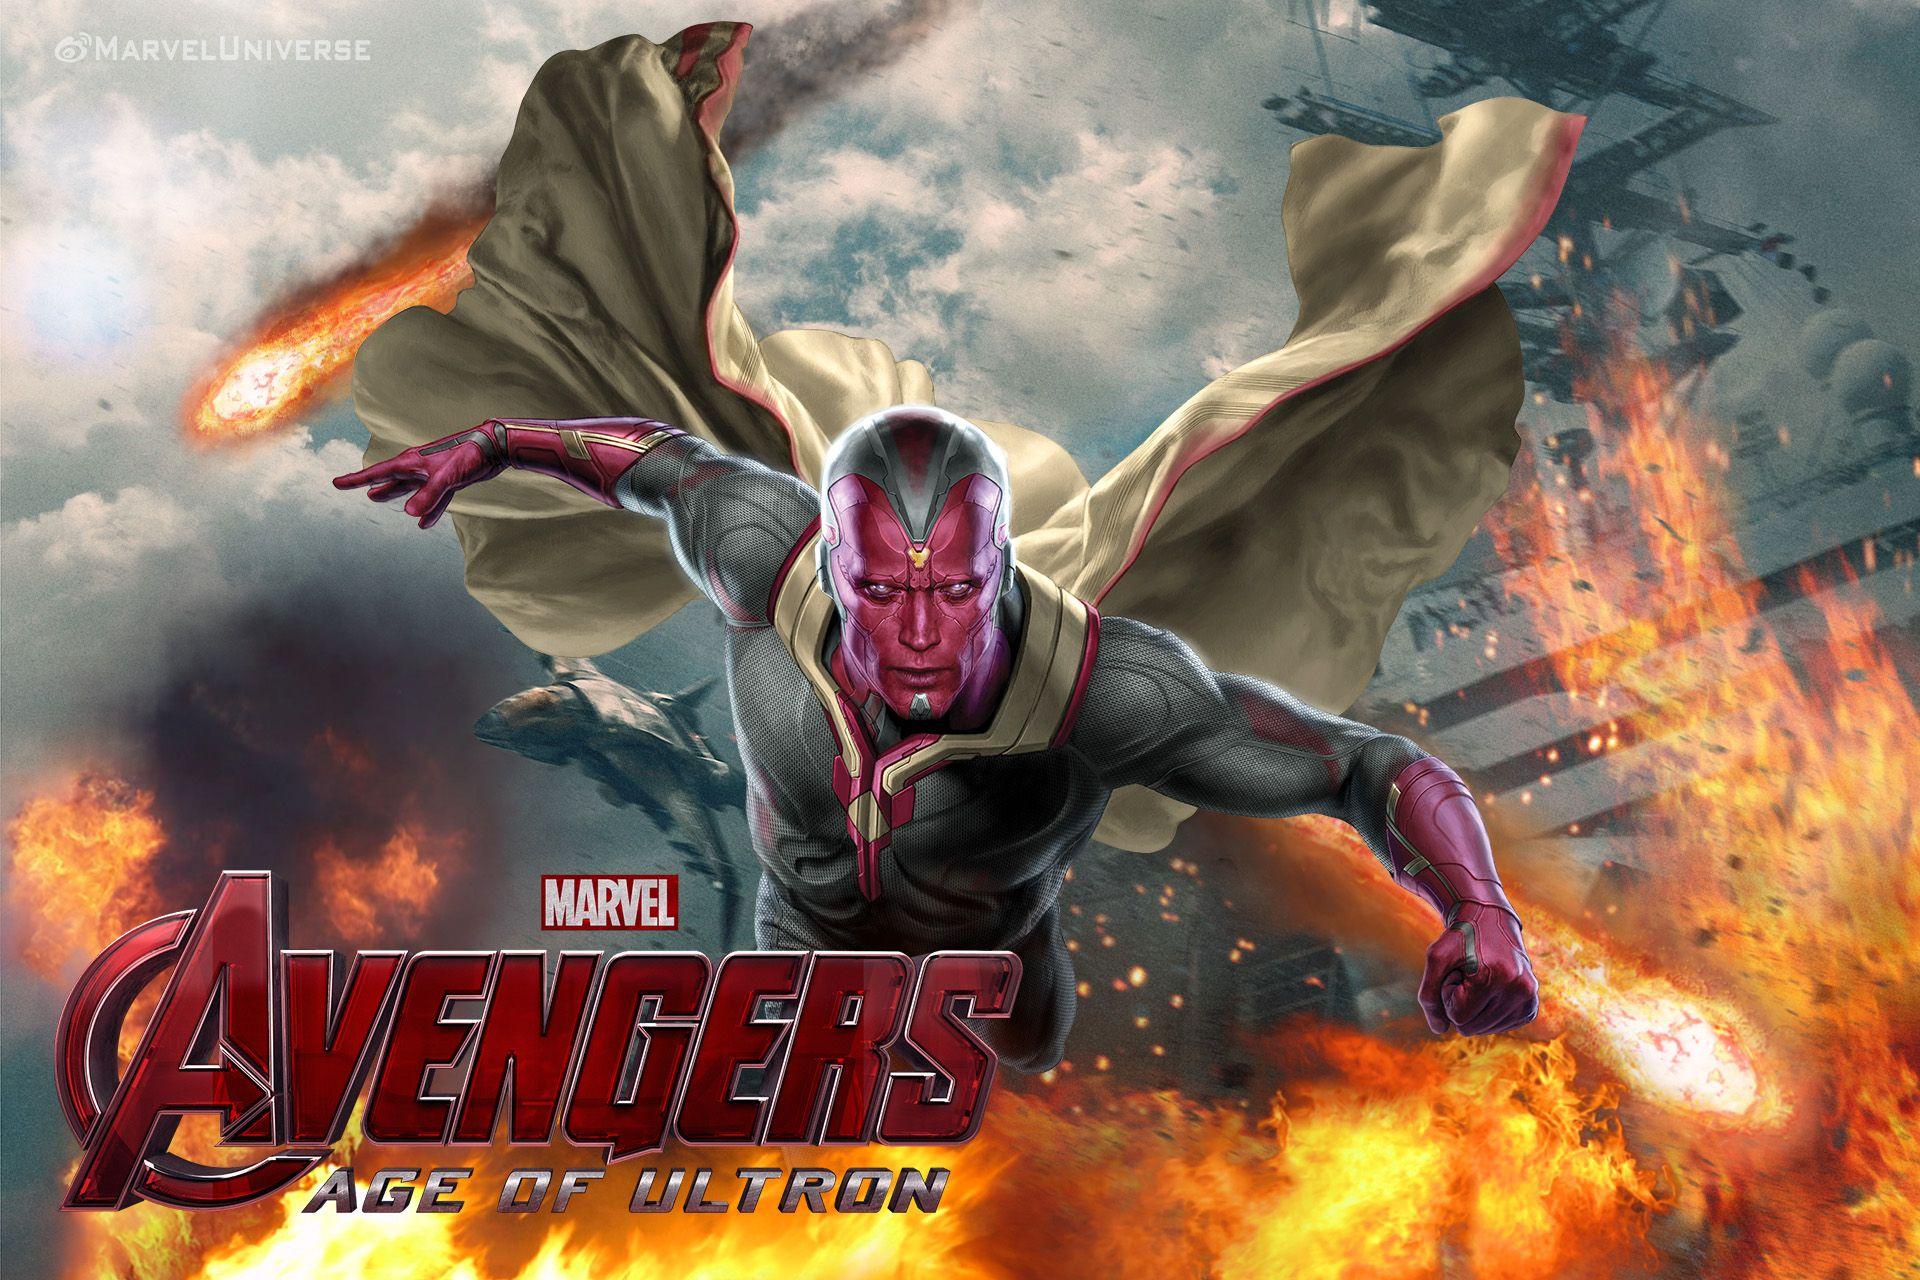 Must see Wallpaper Marvel Avengers Age Ultron - ba9a010d6265806acb381557276b1f4a  Photograph_244626.jpg